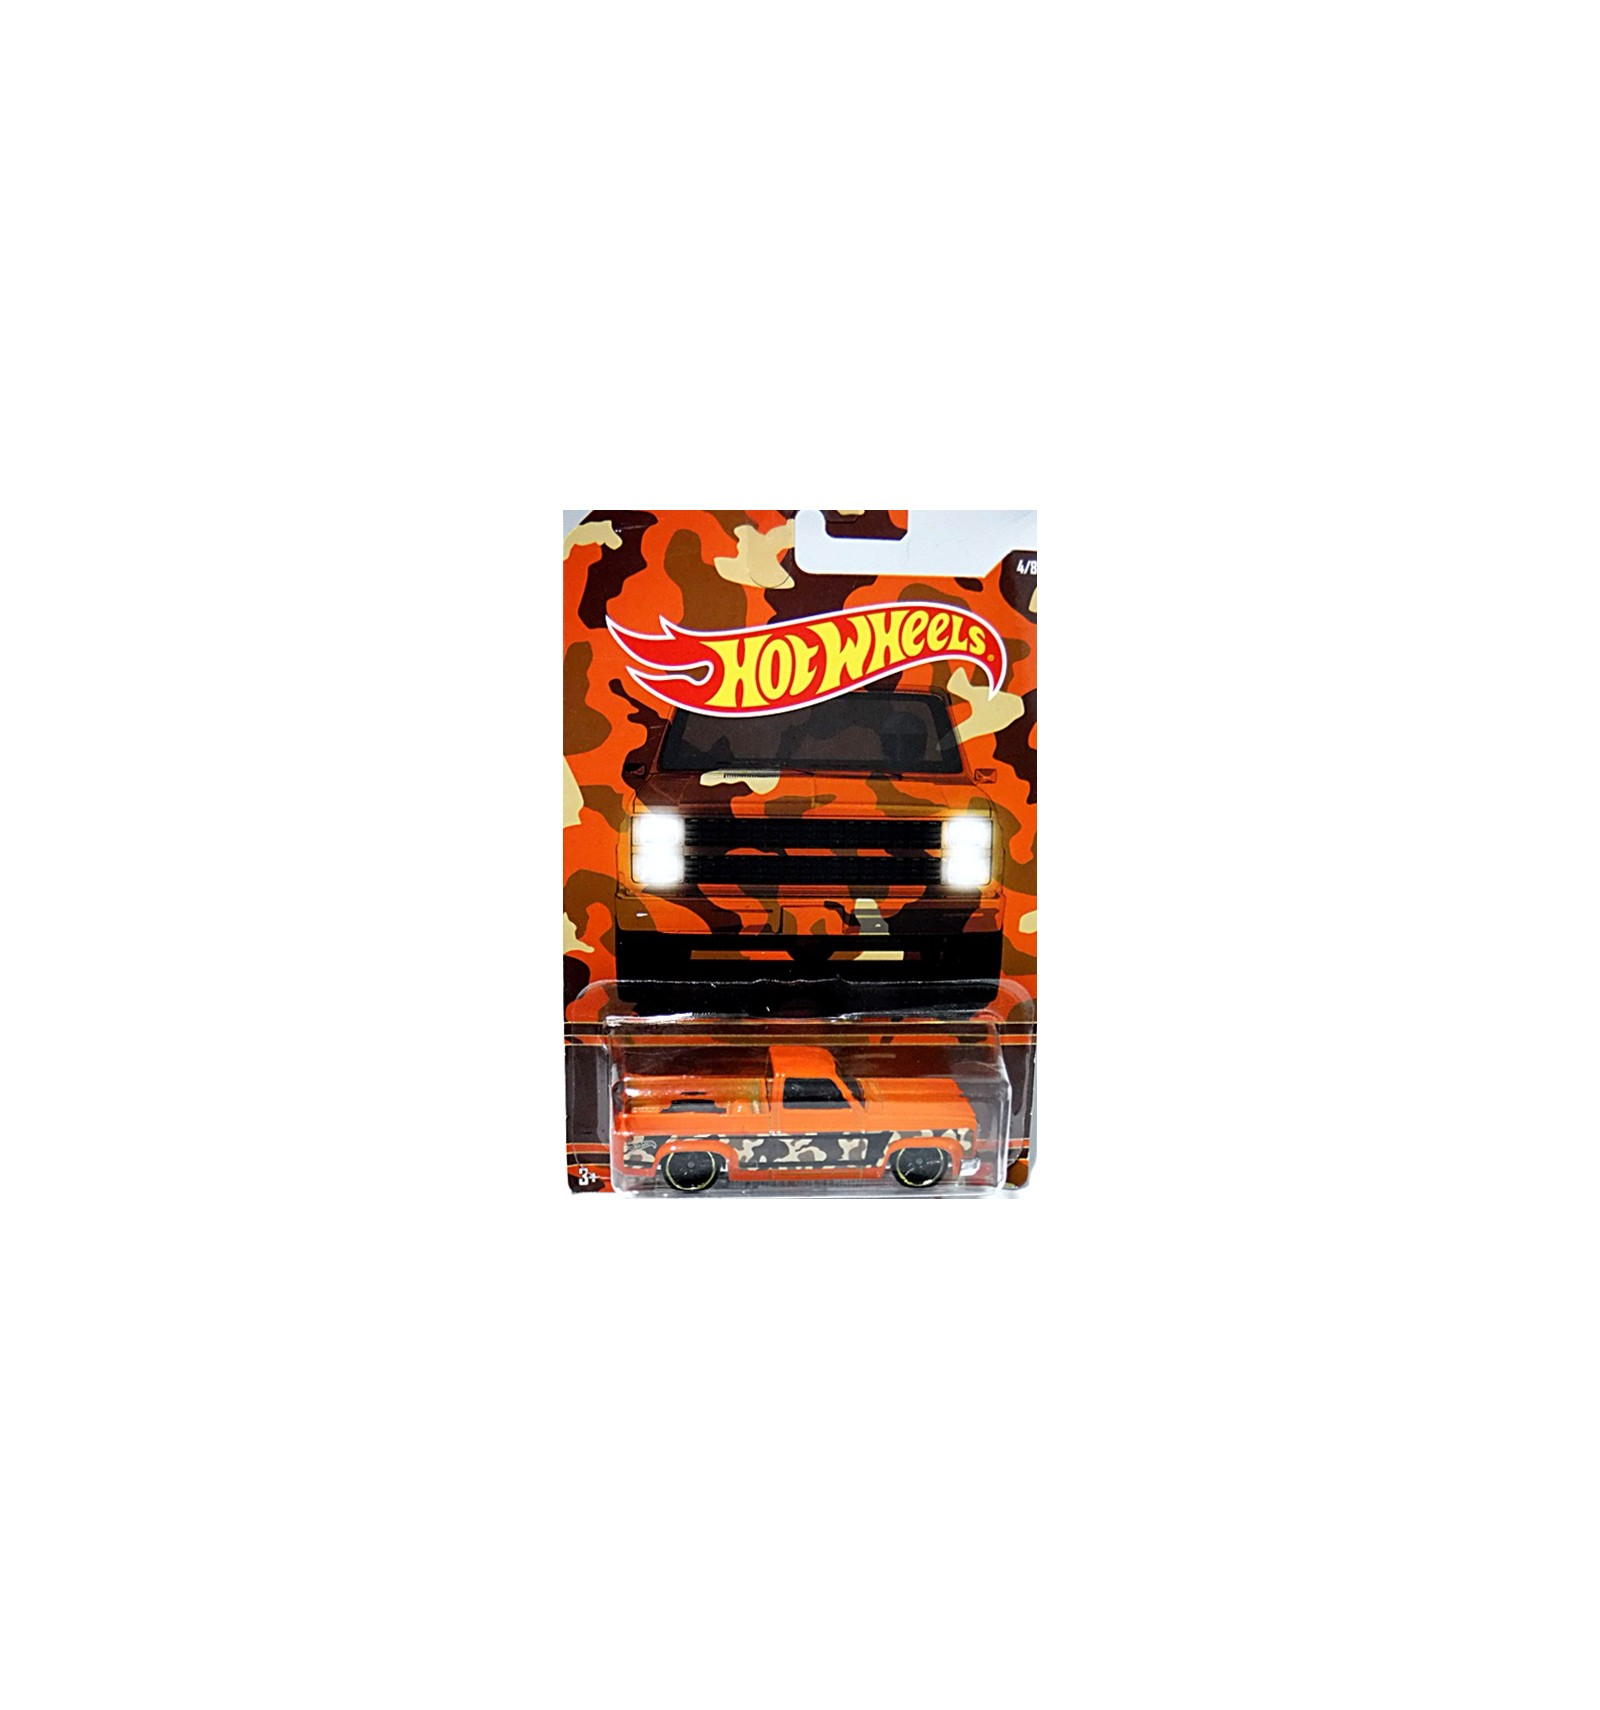 Hot Wheels 1983 Chevy Silverado Pickup Truck Global Diecast Direct C10